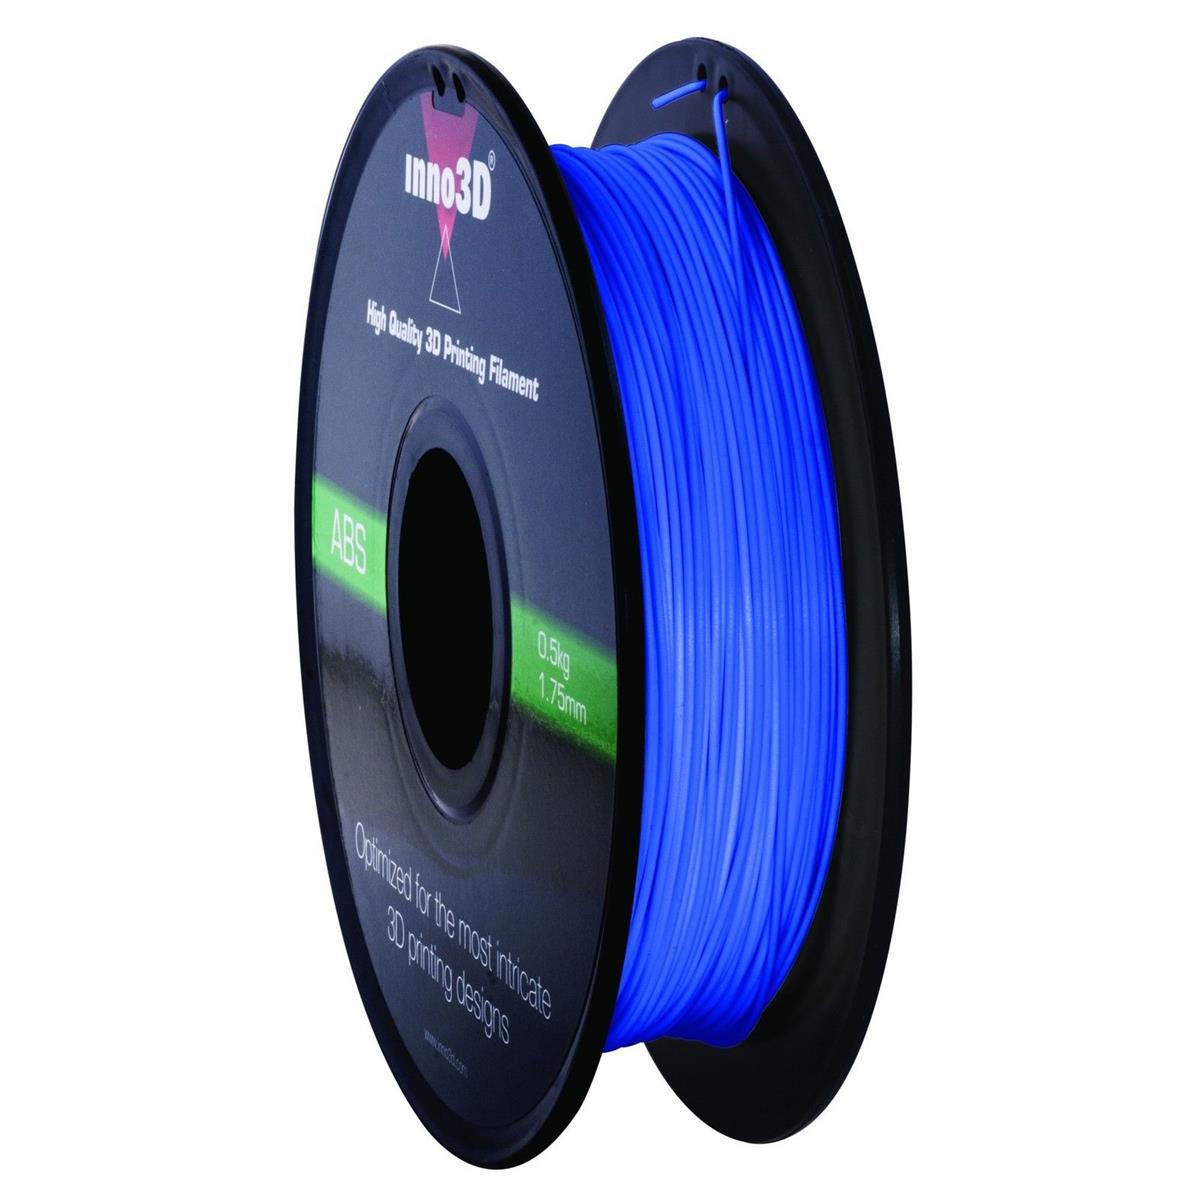 Image for Inno3D ABS Filament for 3D Printer 1.75x200mm 0.5kg Blue Ref 3DPFA175BL05